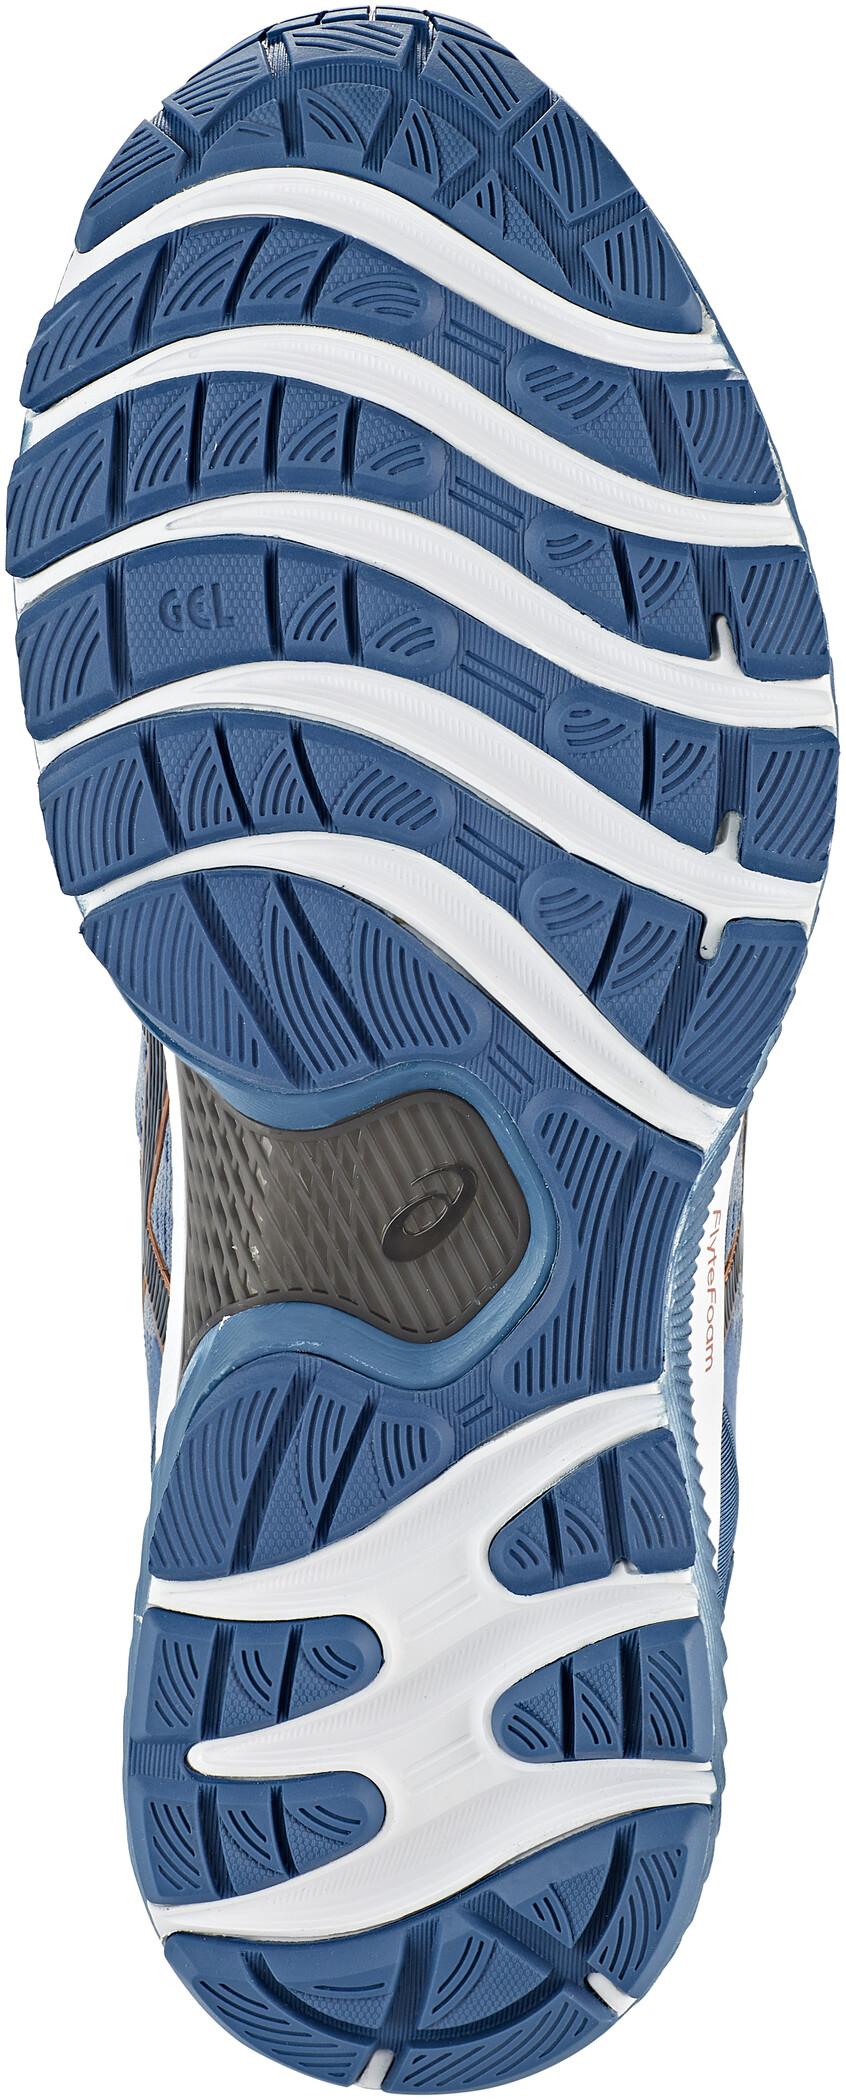 asics Gel Nimbus 22 Shoes Men sheet rockgraphite grey